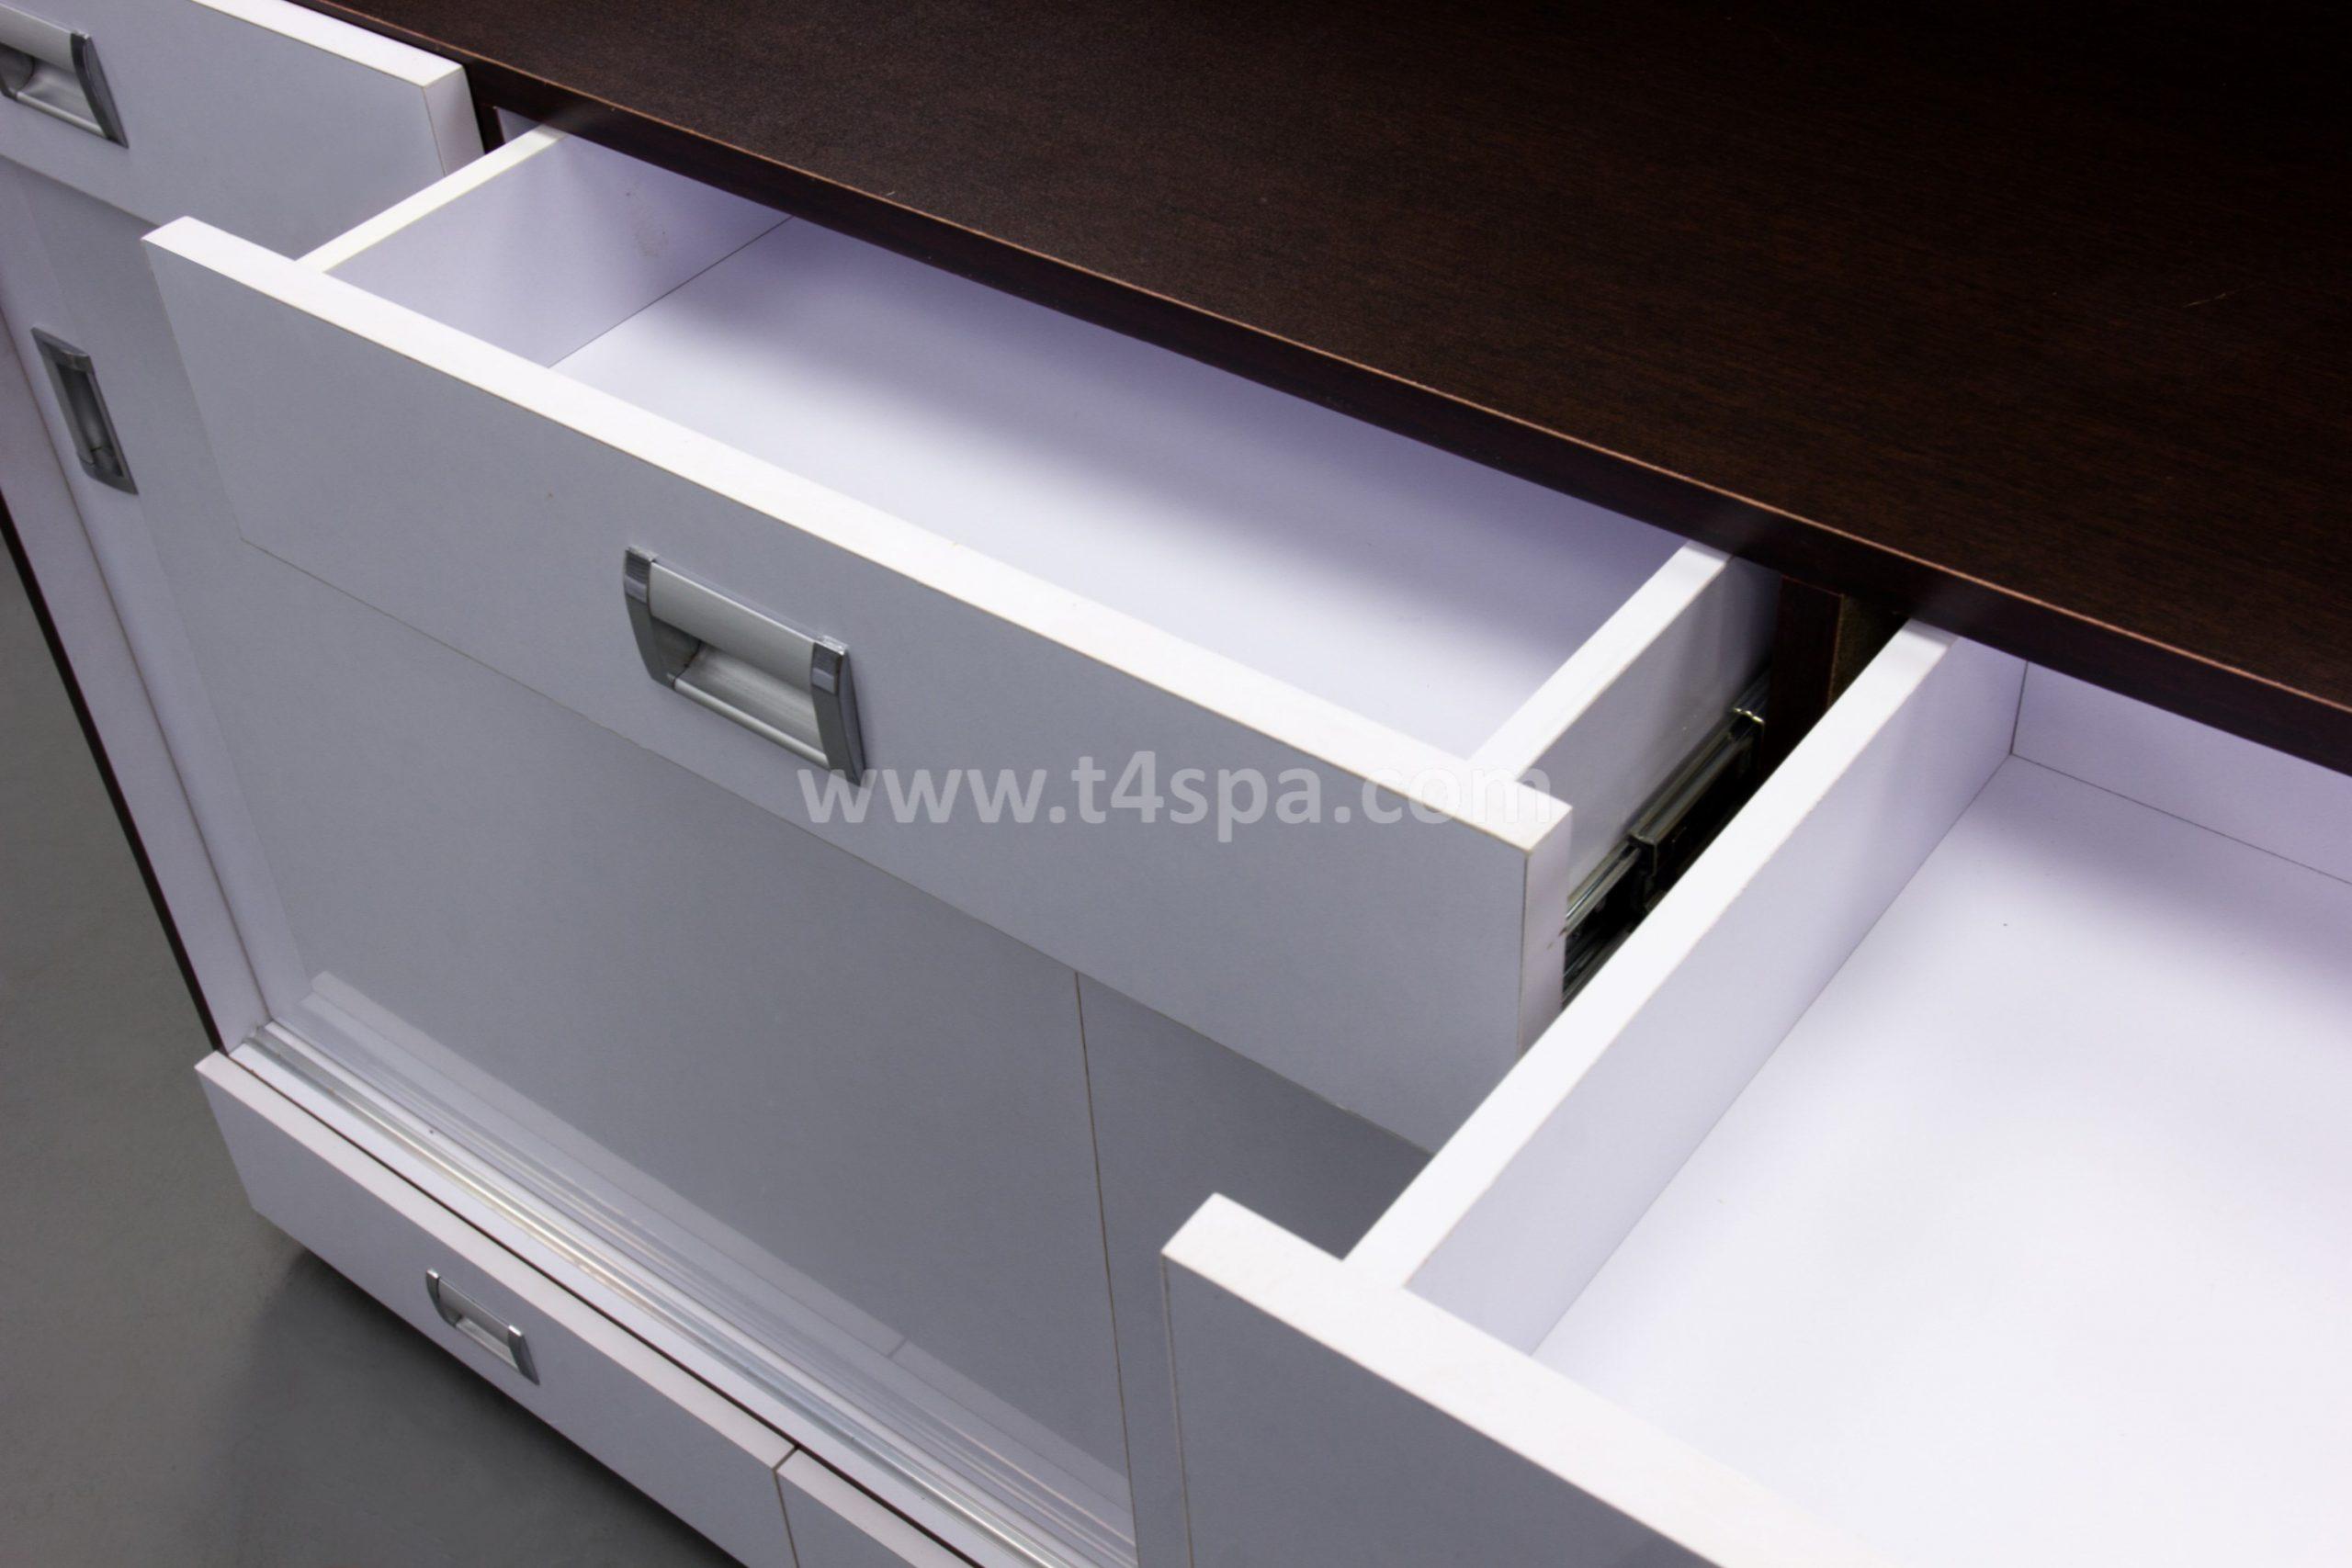 TD-357 Reception Glossy White + Dark Wood Detail (4)